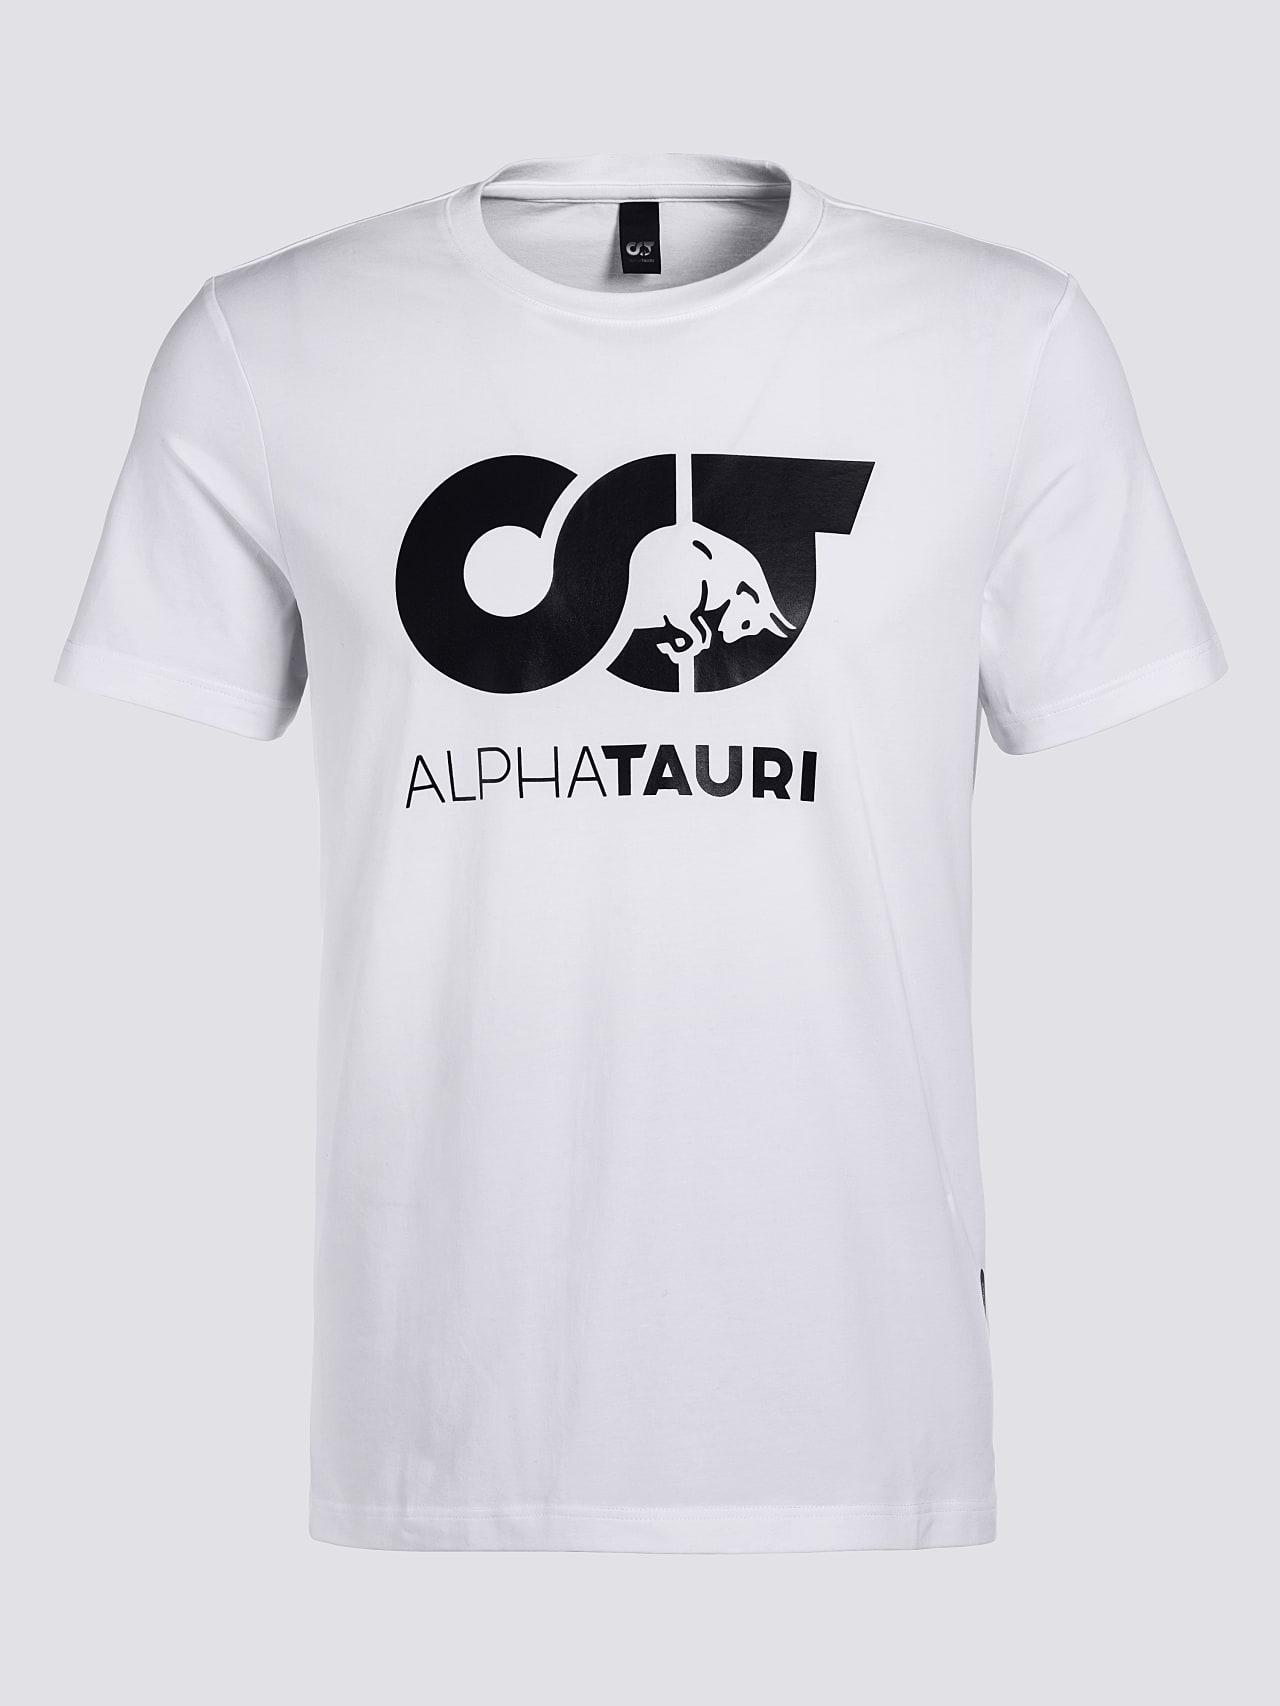 JERO V2.Y4.02 Signature Logo T-Shirt white Back Alpha Tauri